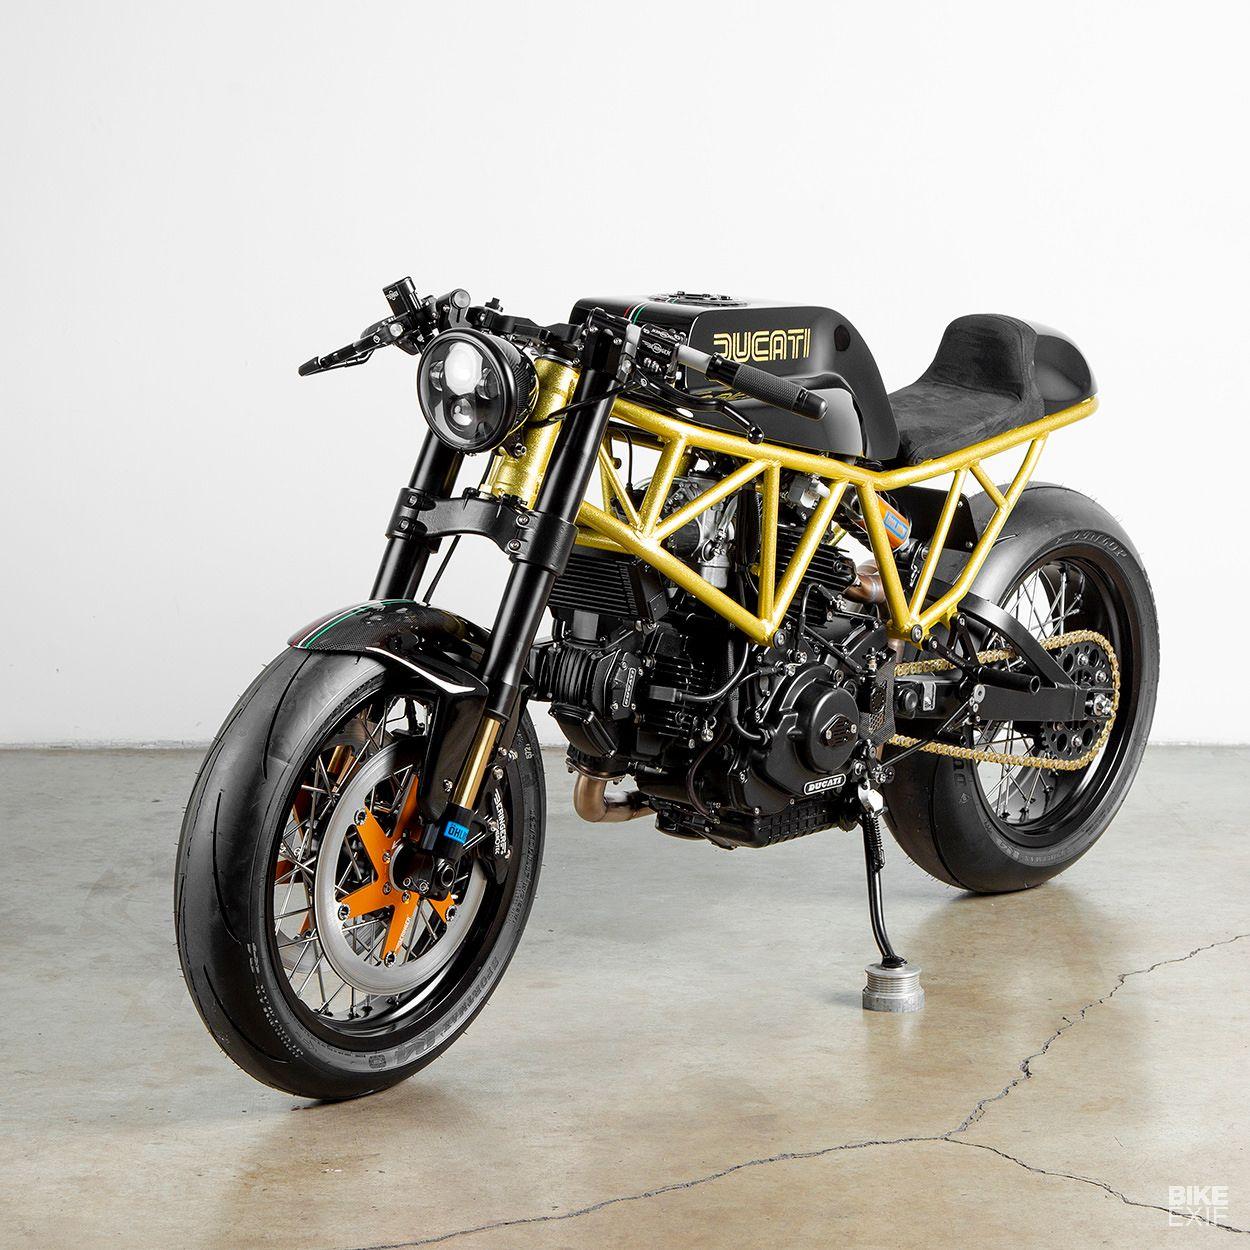 Caffe Nero Lossa Engineering S Ducati 900ss